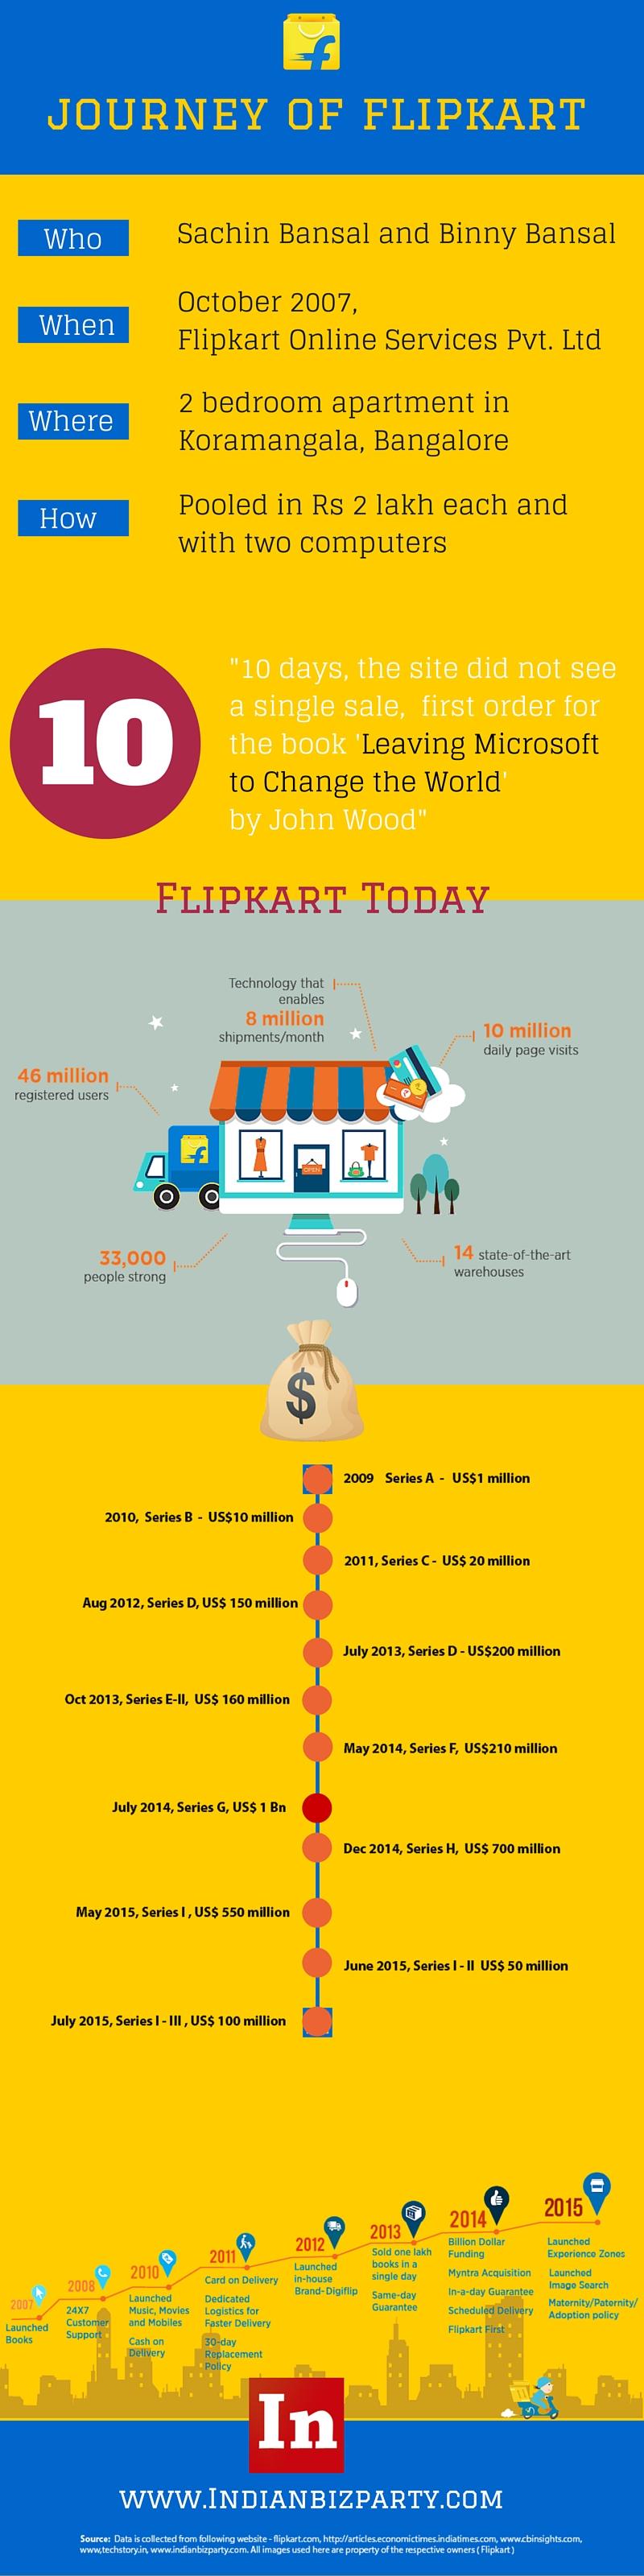 Flipkart-Online-Services-Pvt.